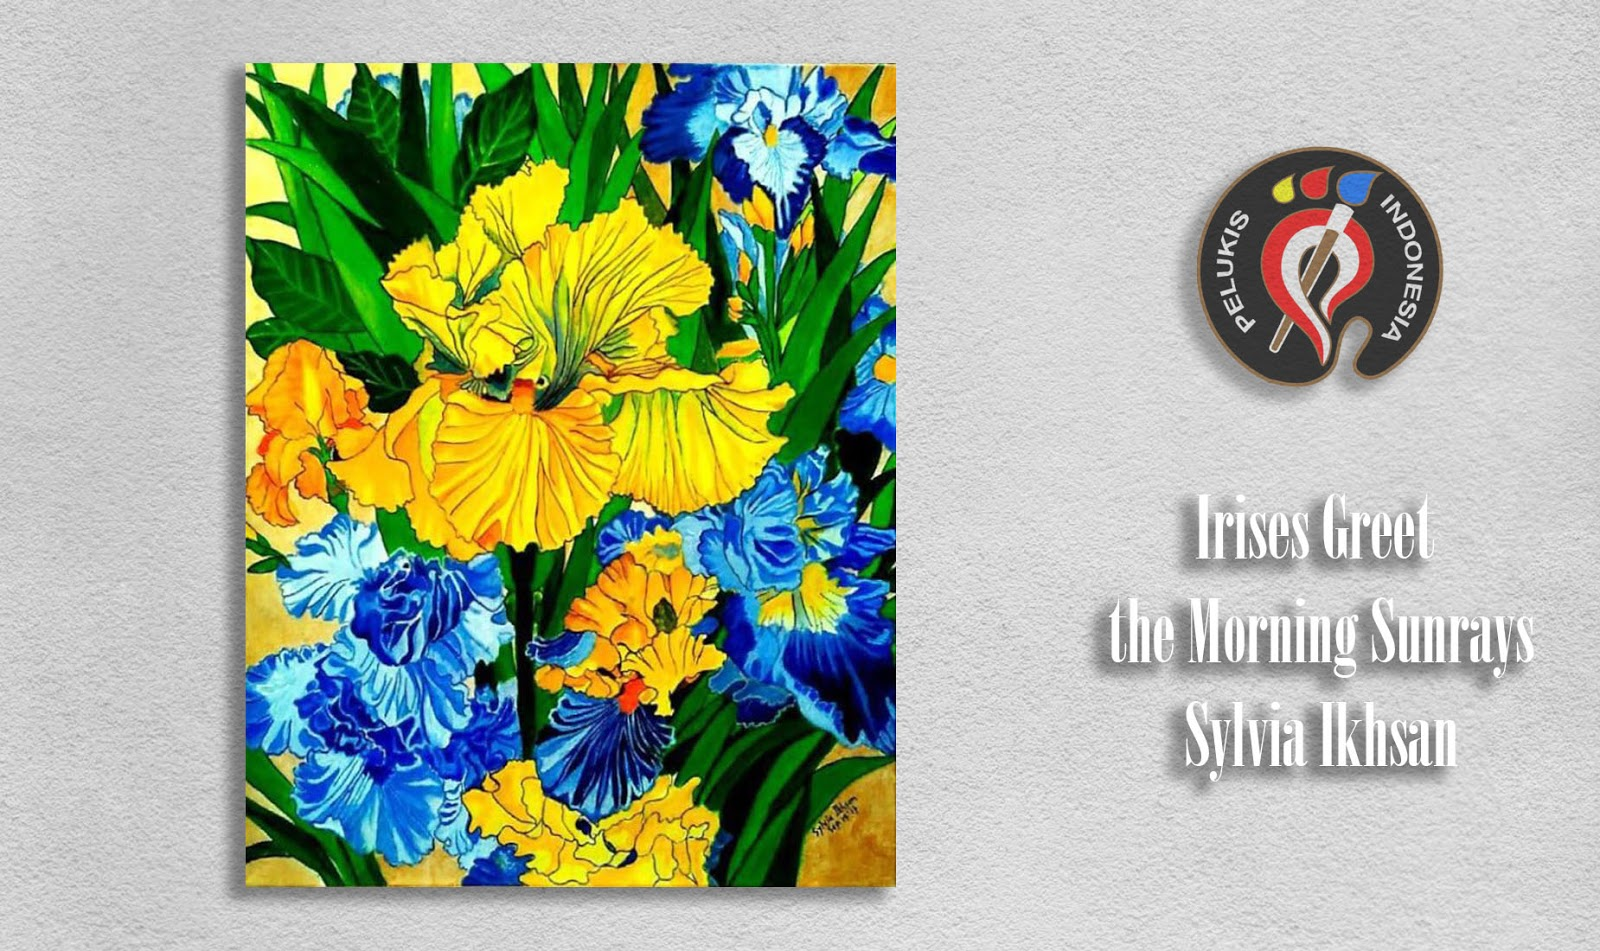 Irises Greet The Morning Sunrays